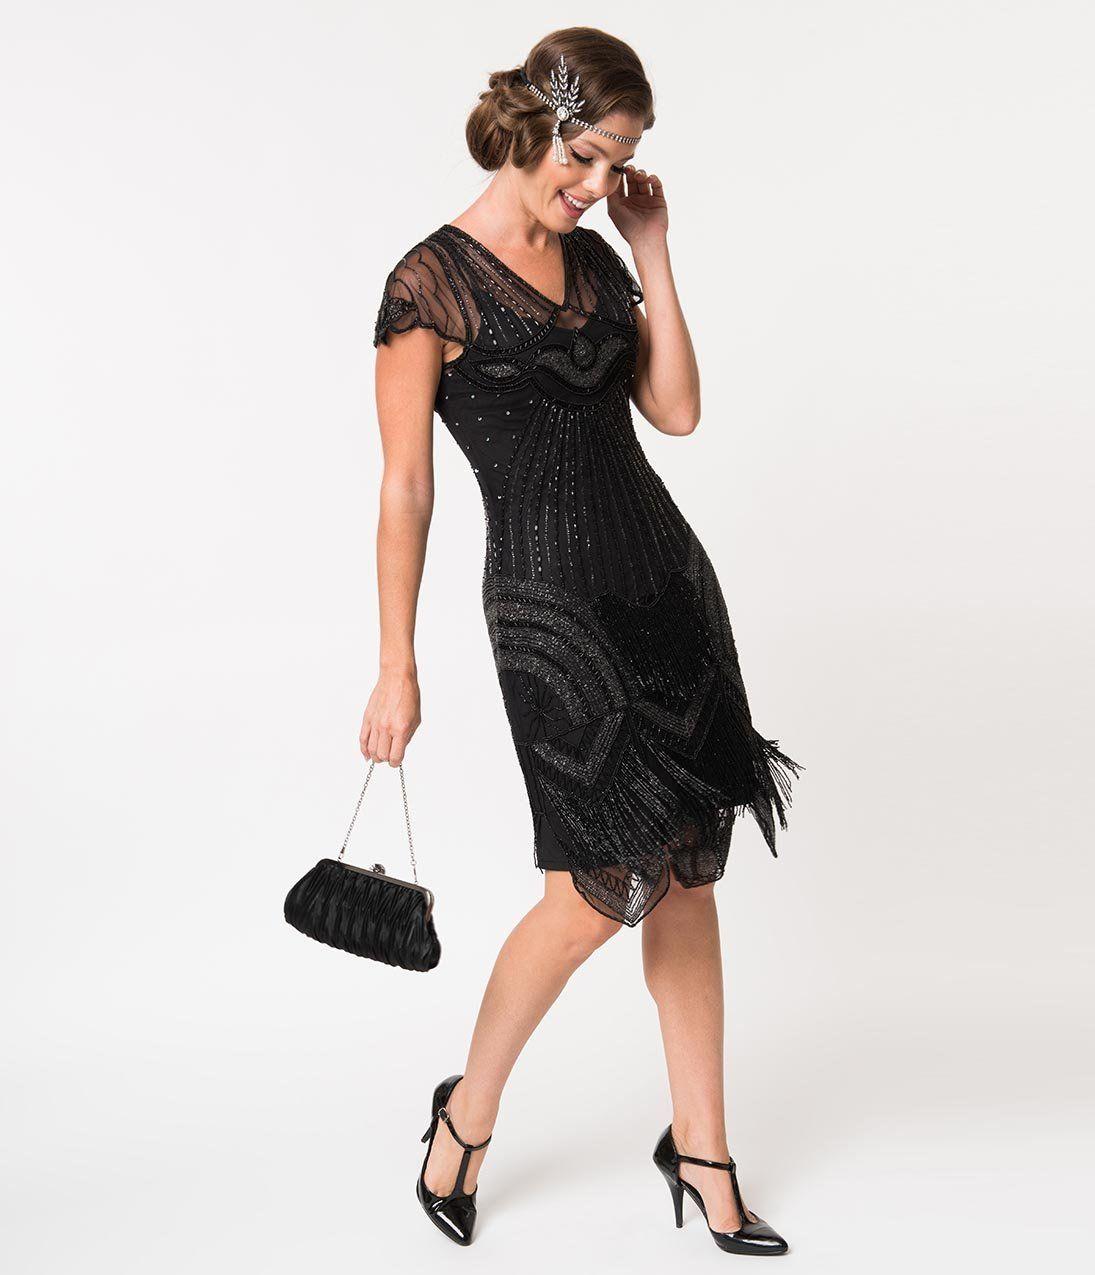 Flapper Dresses Quality Flapper Costumes 1920s Style Black Beaded Deco Cap Sleeve Beatrice Flapper Dress 1 1920s Fashion Dresses Flapper Dress 1920s Fashion [ 1275 x 1095 Pixel ]